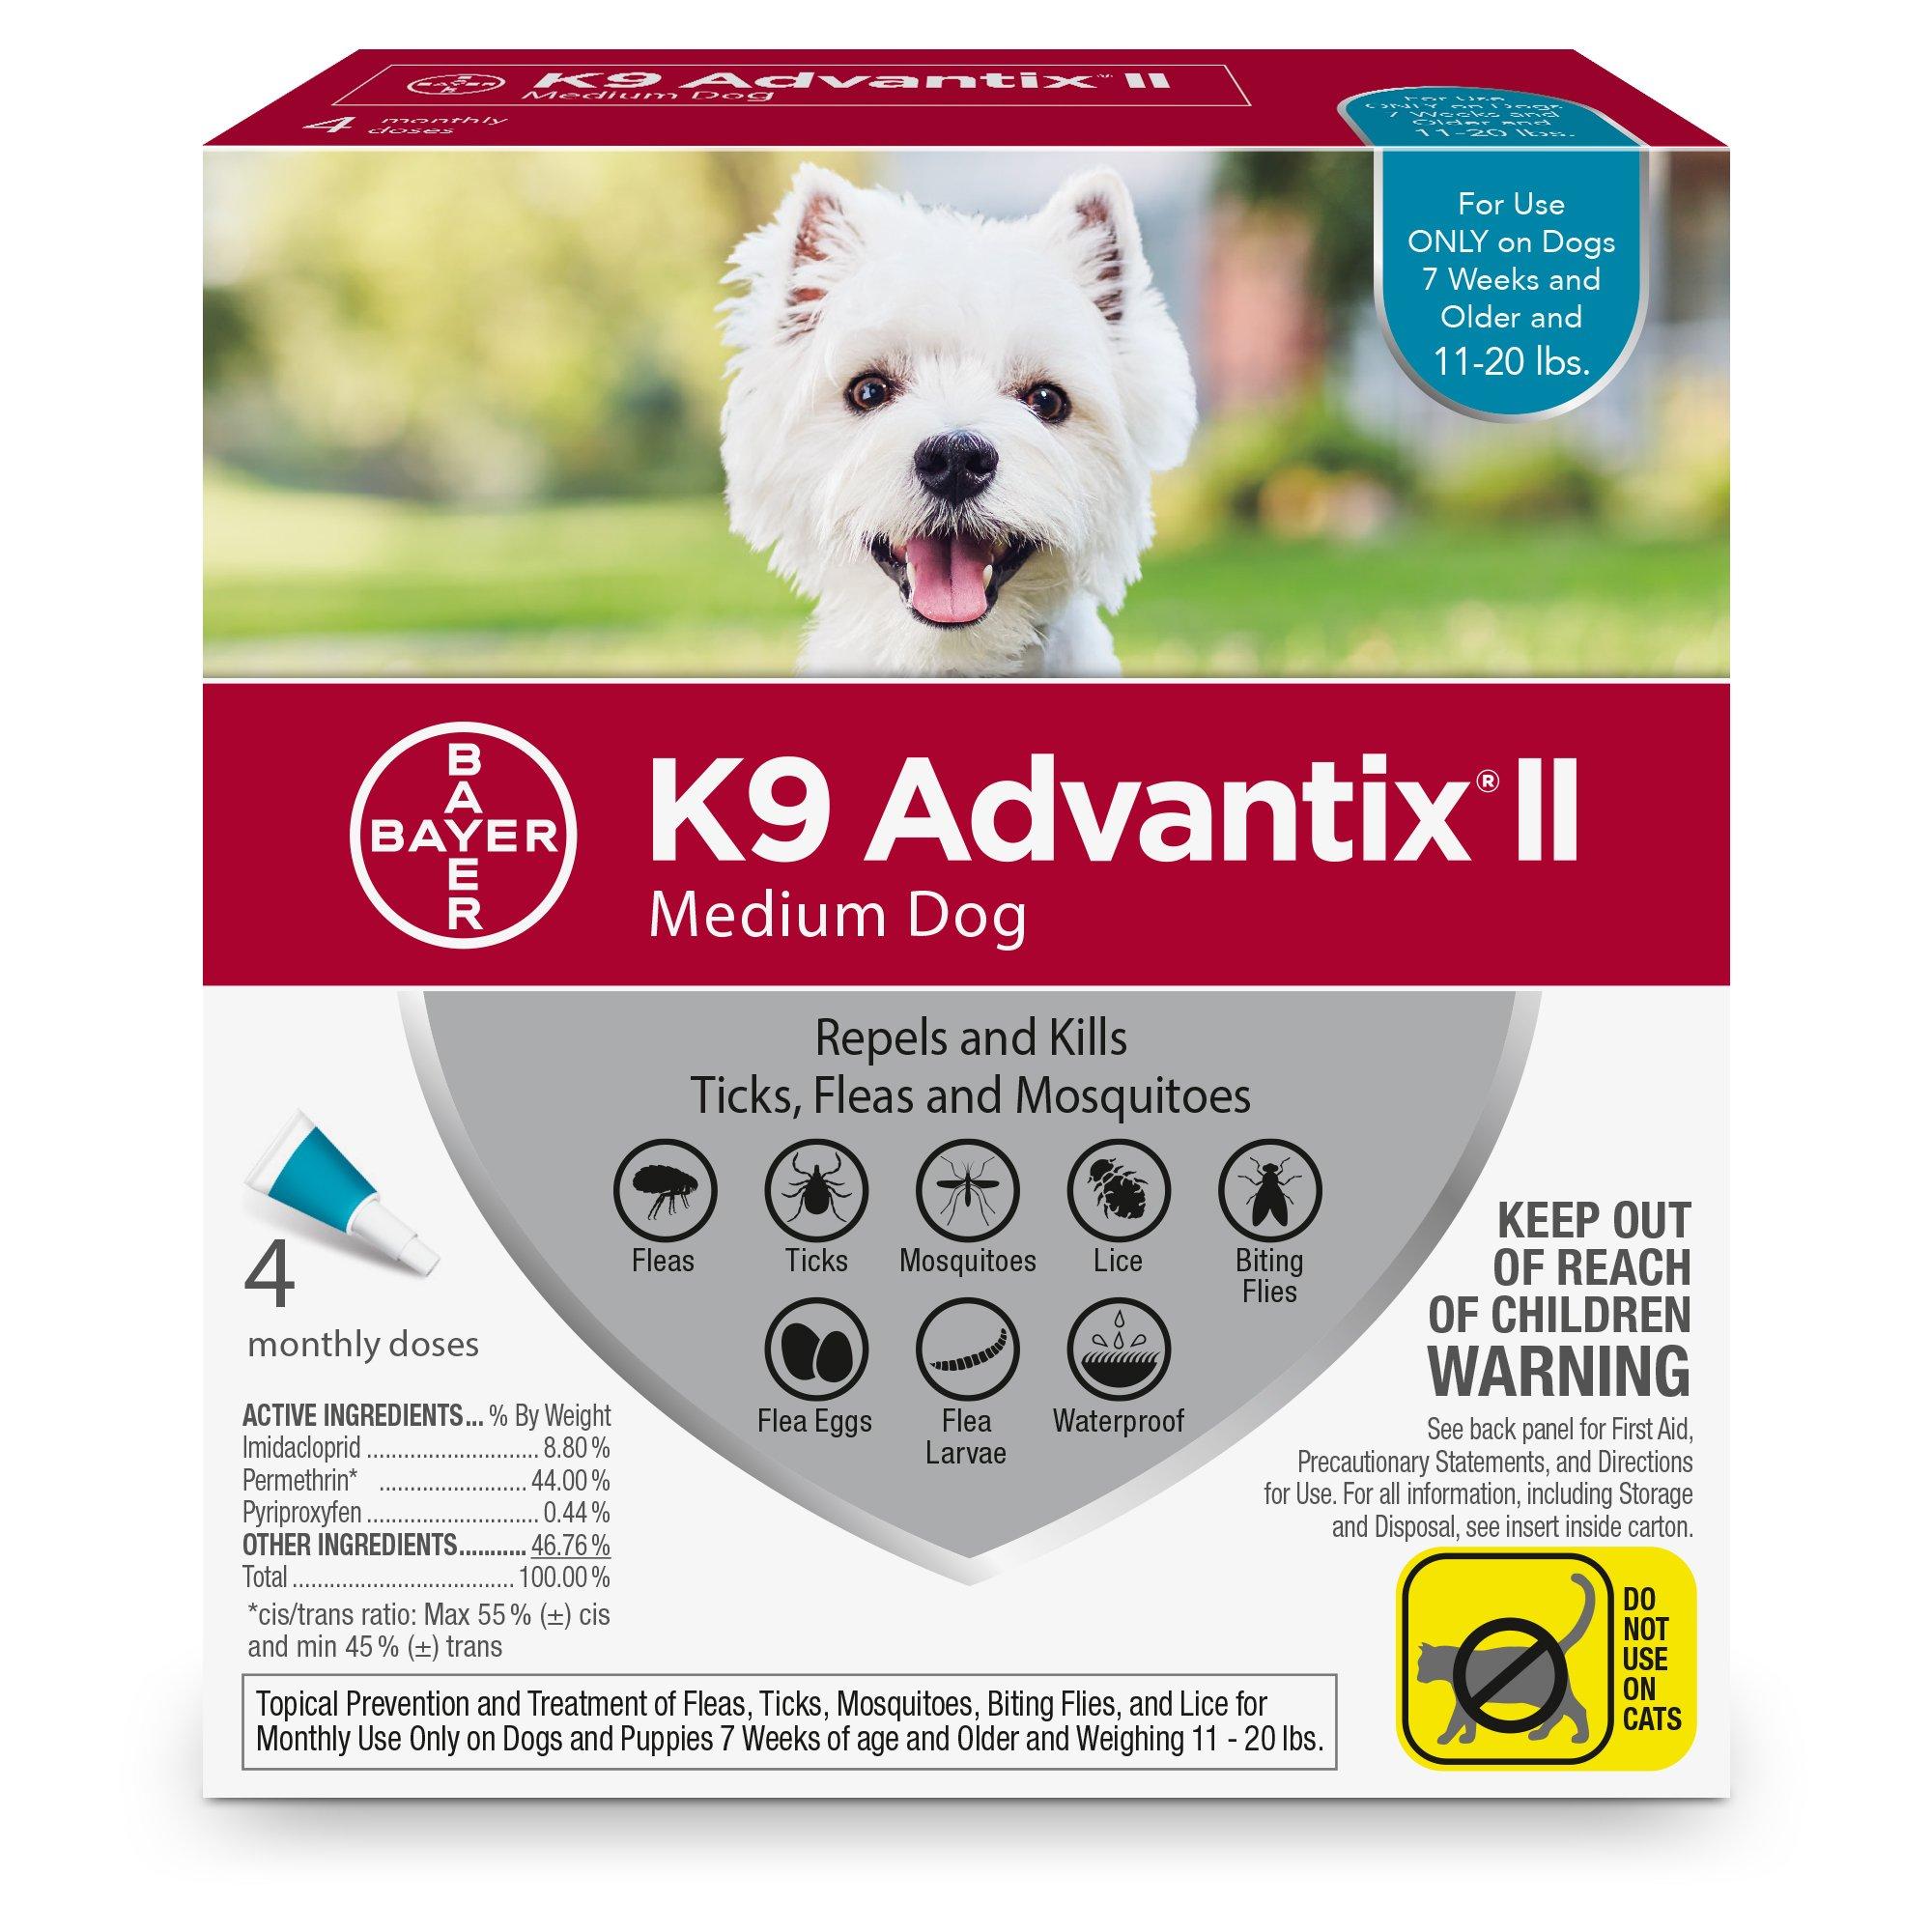 Bayer K9 Advantix II Flea, Tick and Mosquito Prevention for Medium Dogs, 11 - 20 lb, 4 doses